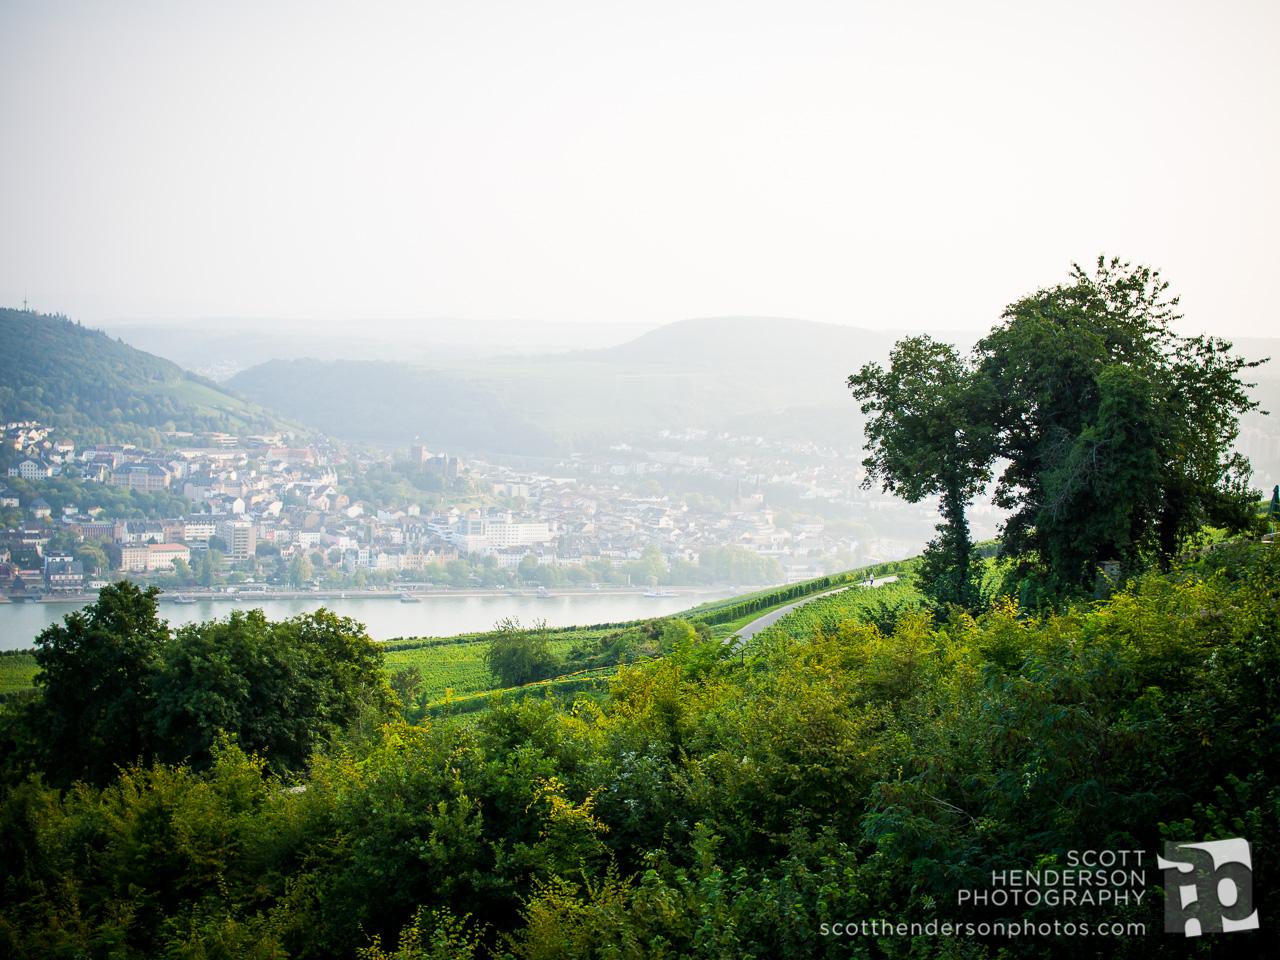 shp-germany-2014-020-blog.jpg